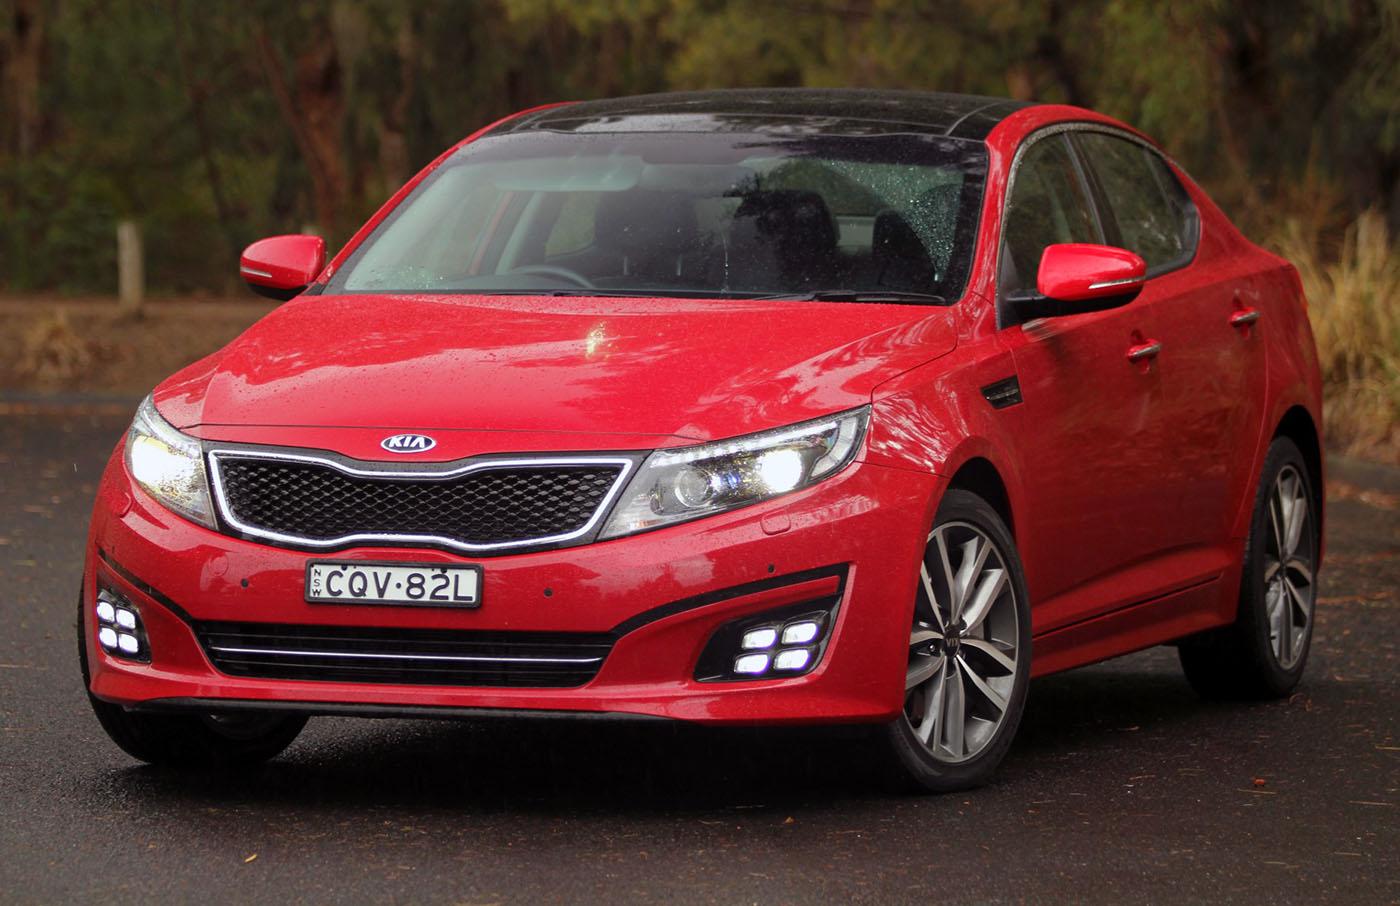 2014 Kia Optima Review: 'Platinum' Petrol Auto